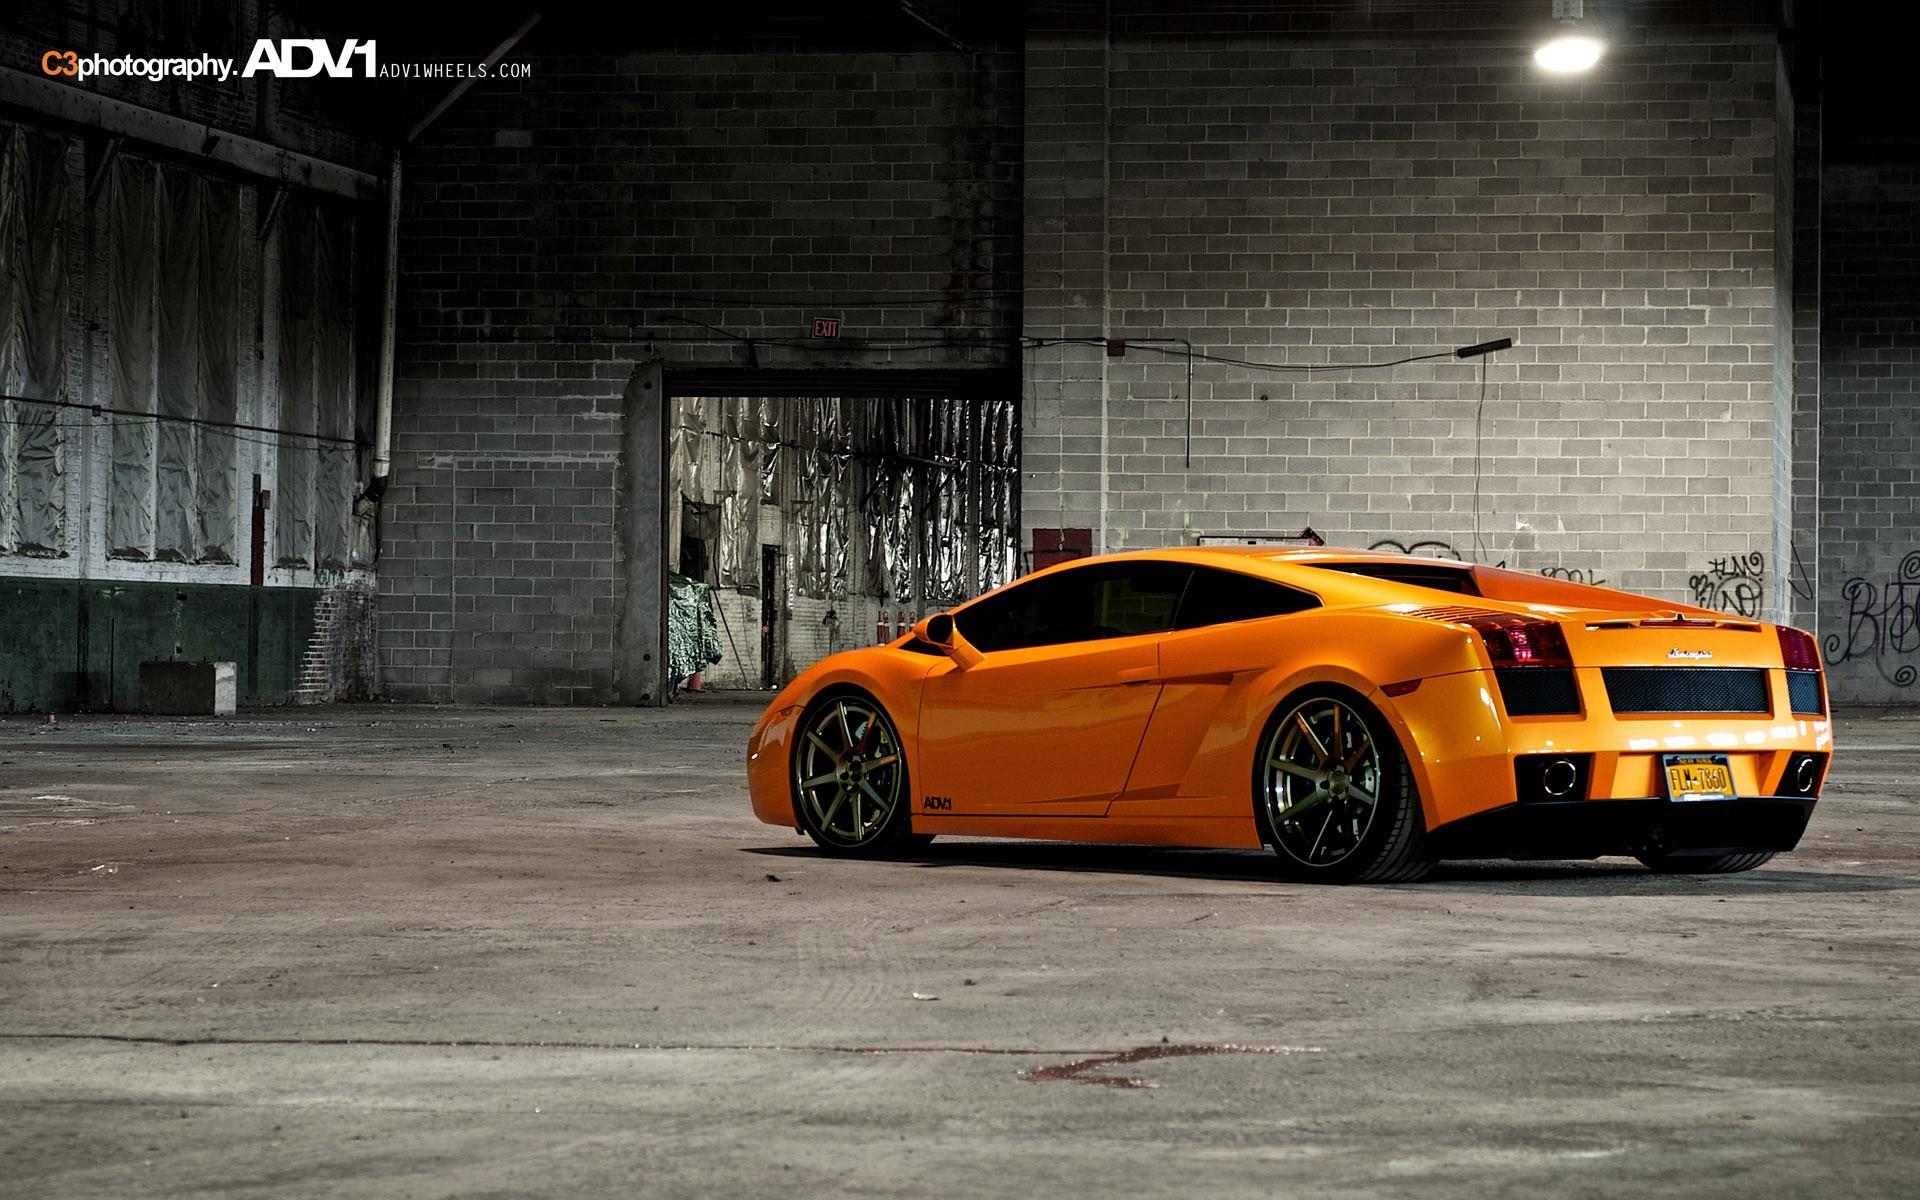 Bmw Hd Wallpapers 1080p Download Lamborghini Gallardo Adv1 Shoot Wallpaper Hd Car